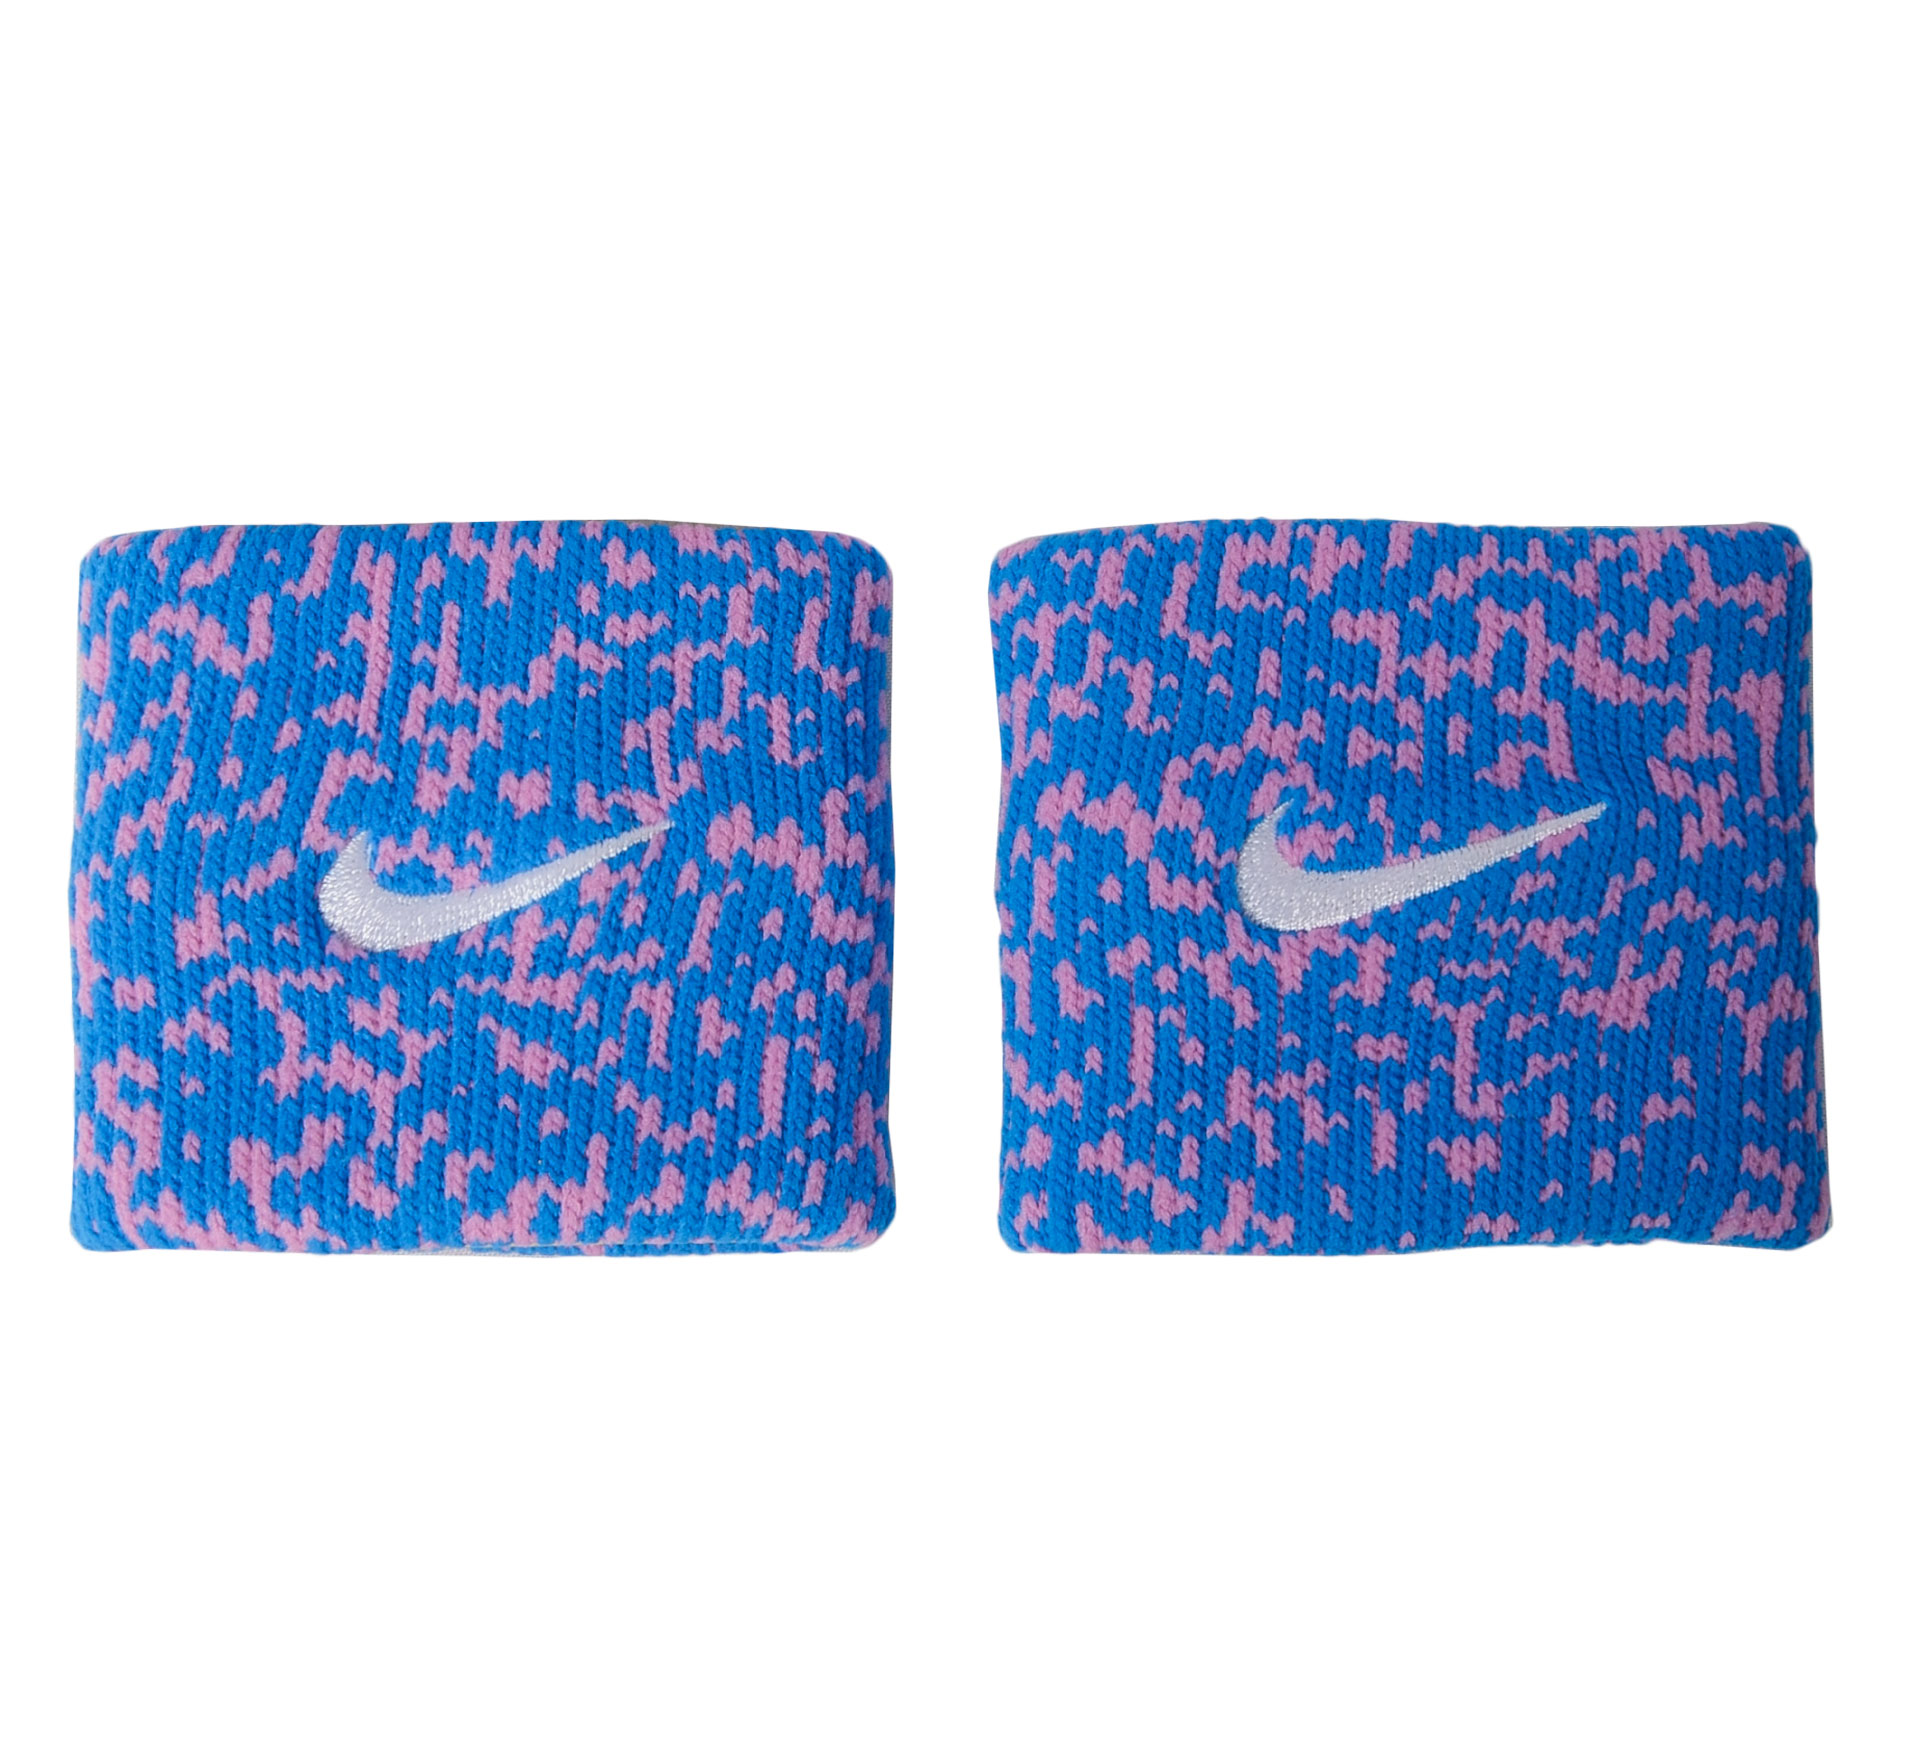 Nike Ace Polsbandjes blauw - roze - wit